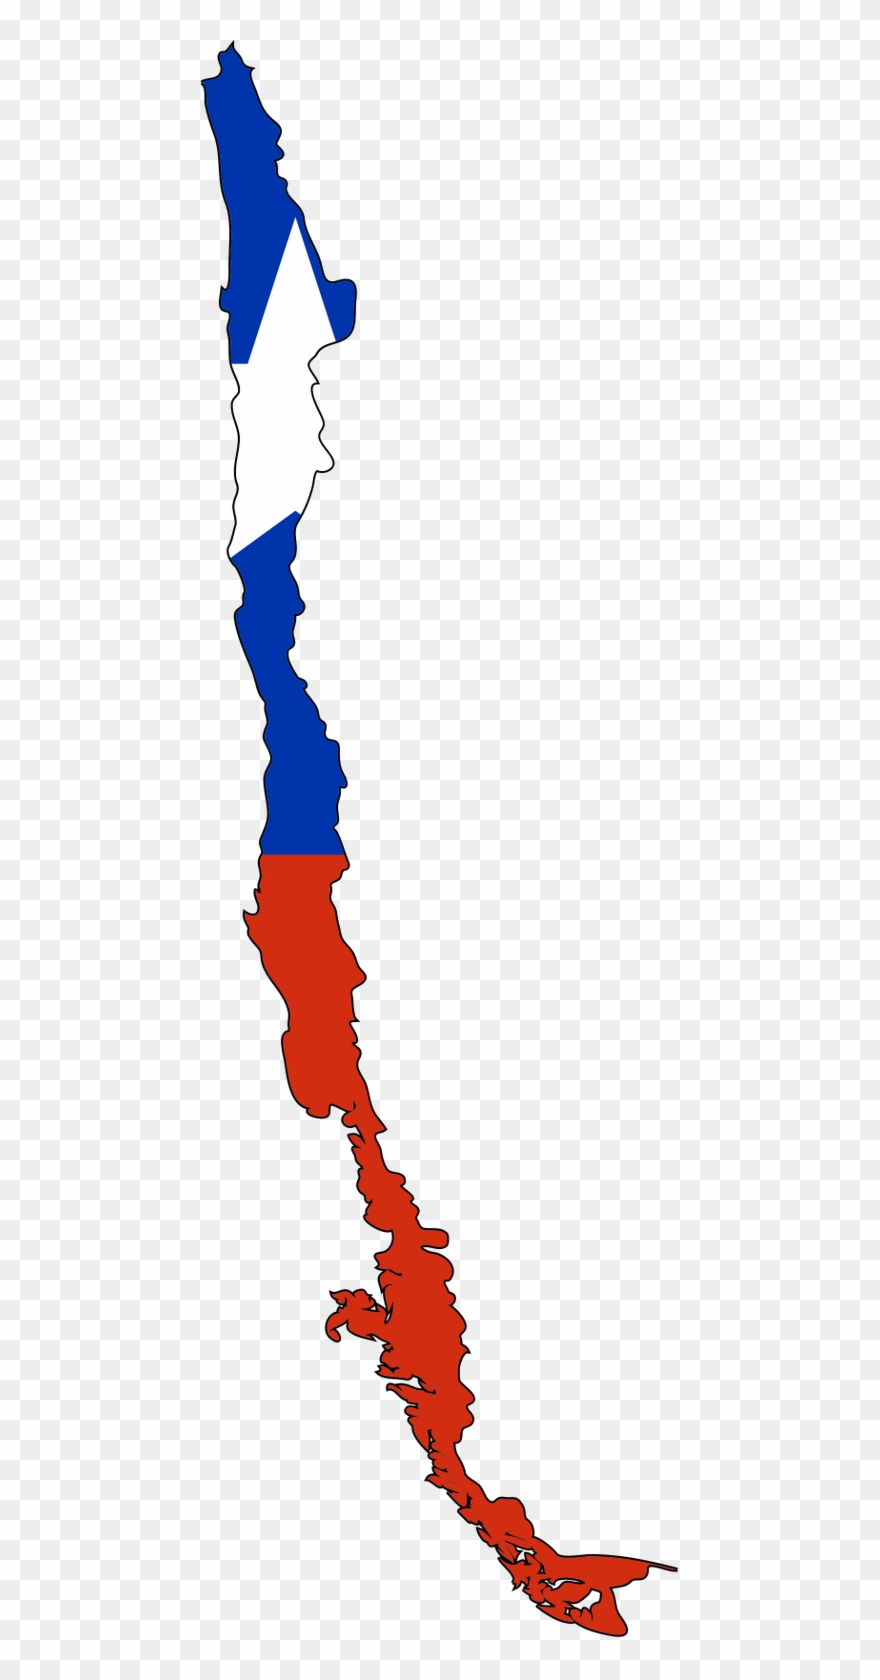 Chile Flag Clipart Hd.